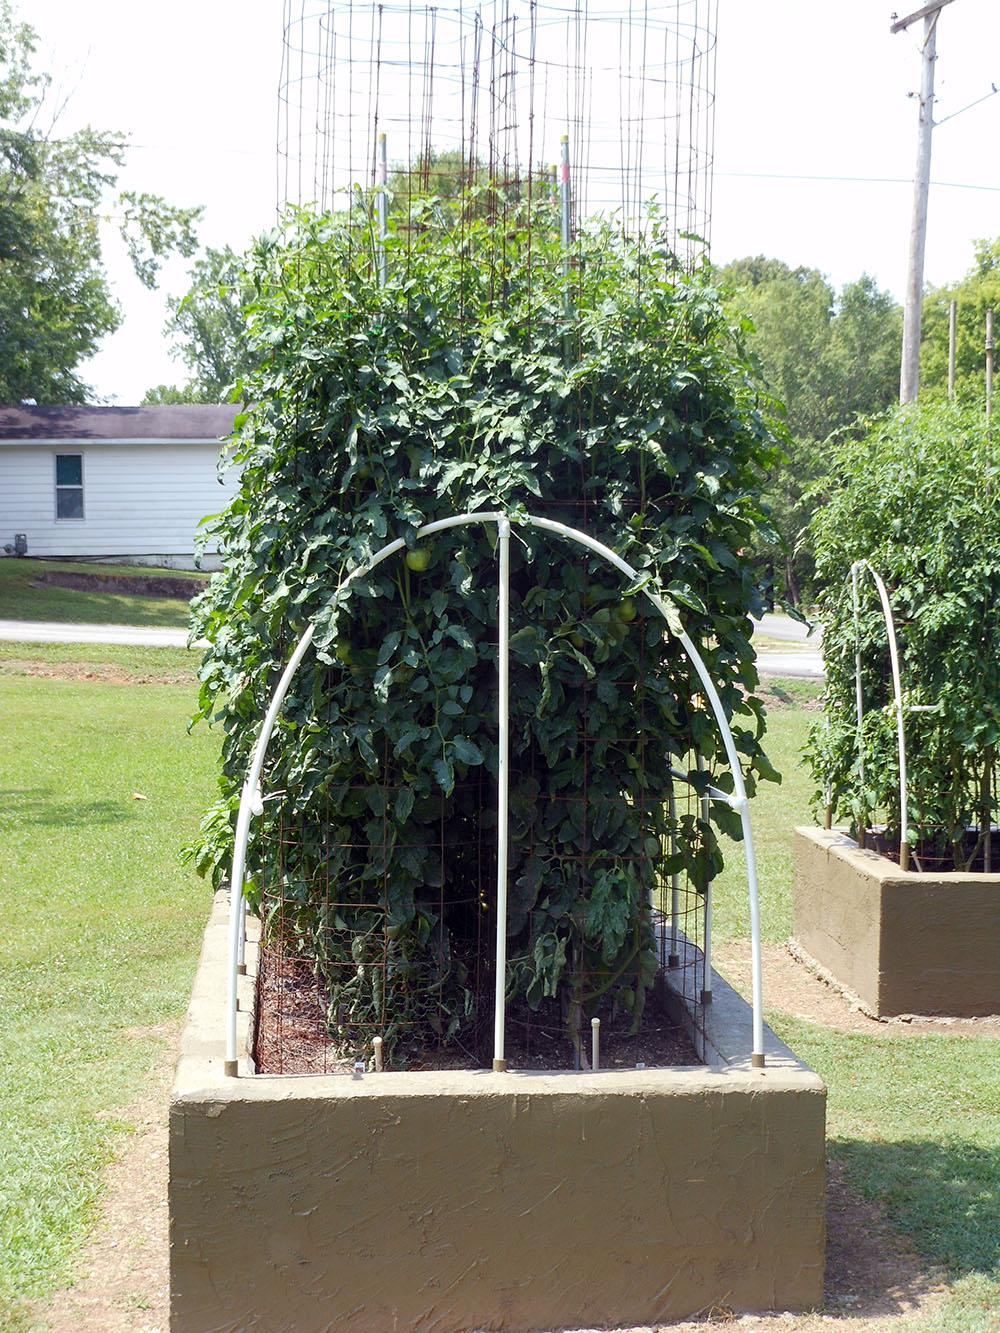 06-24-2015 Garden 01 Better Boy Tomato Plants 01